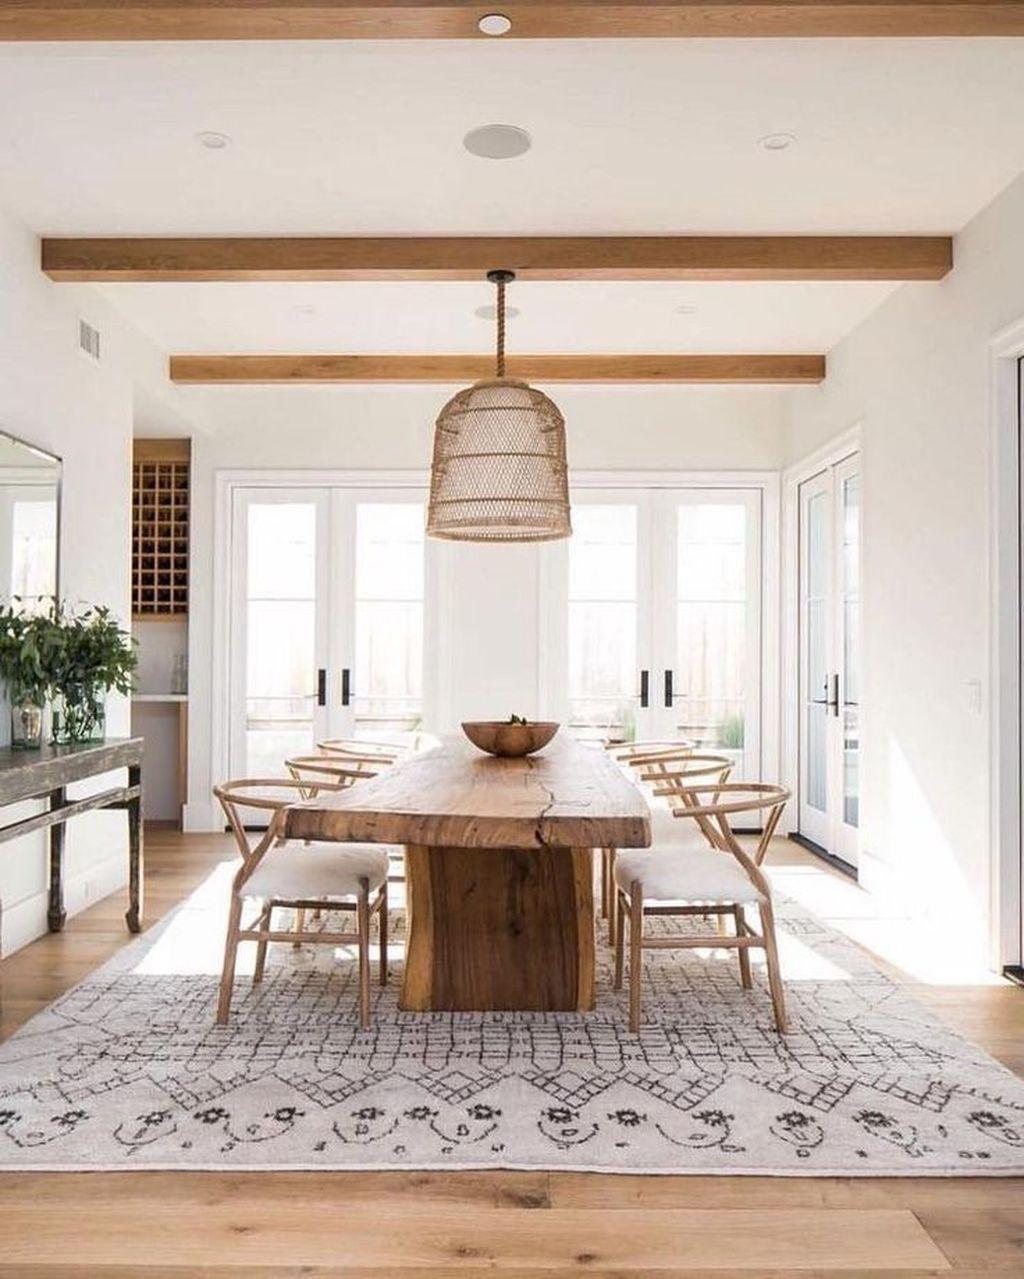 32 Admirable Dining Room Design Ideas Pimphomee Scandinavian Dining Room Wood Dining Room Table Dining Room Table Decor